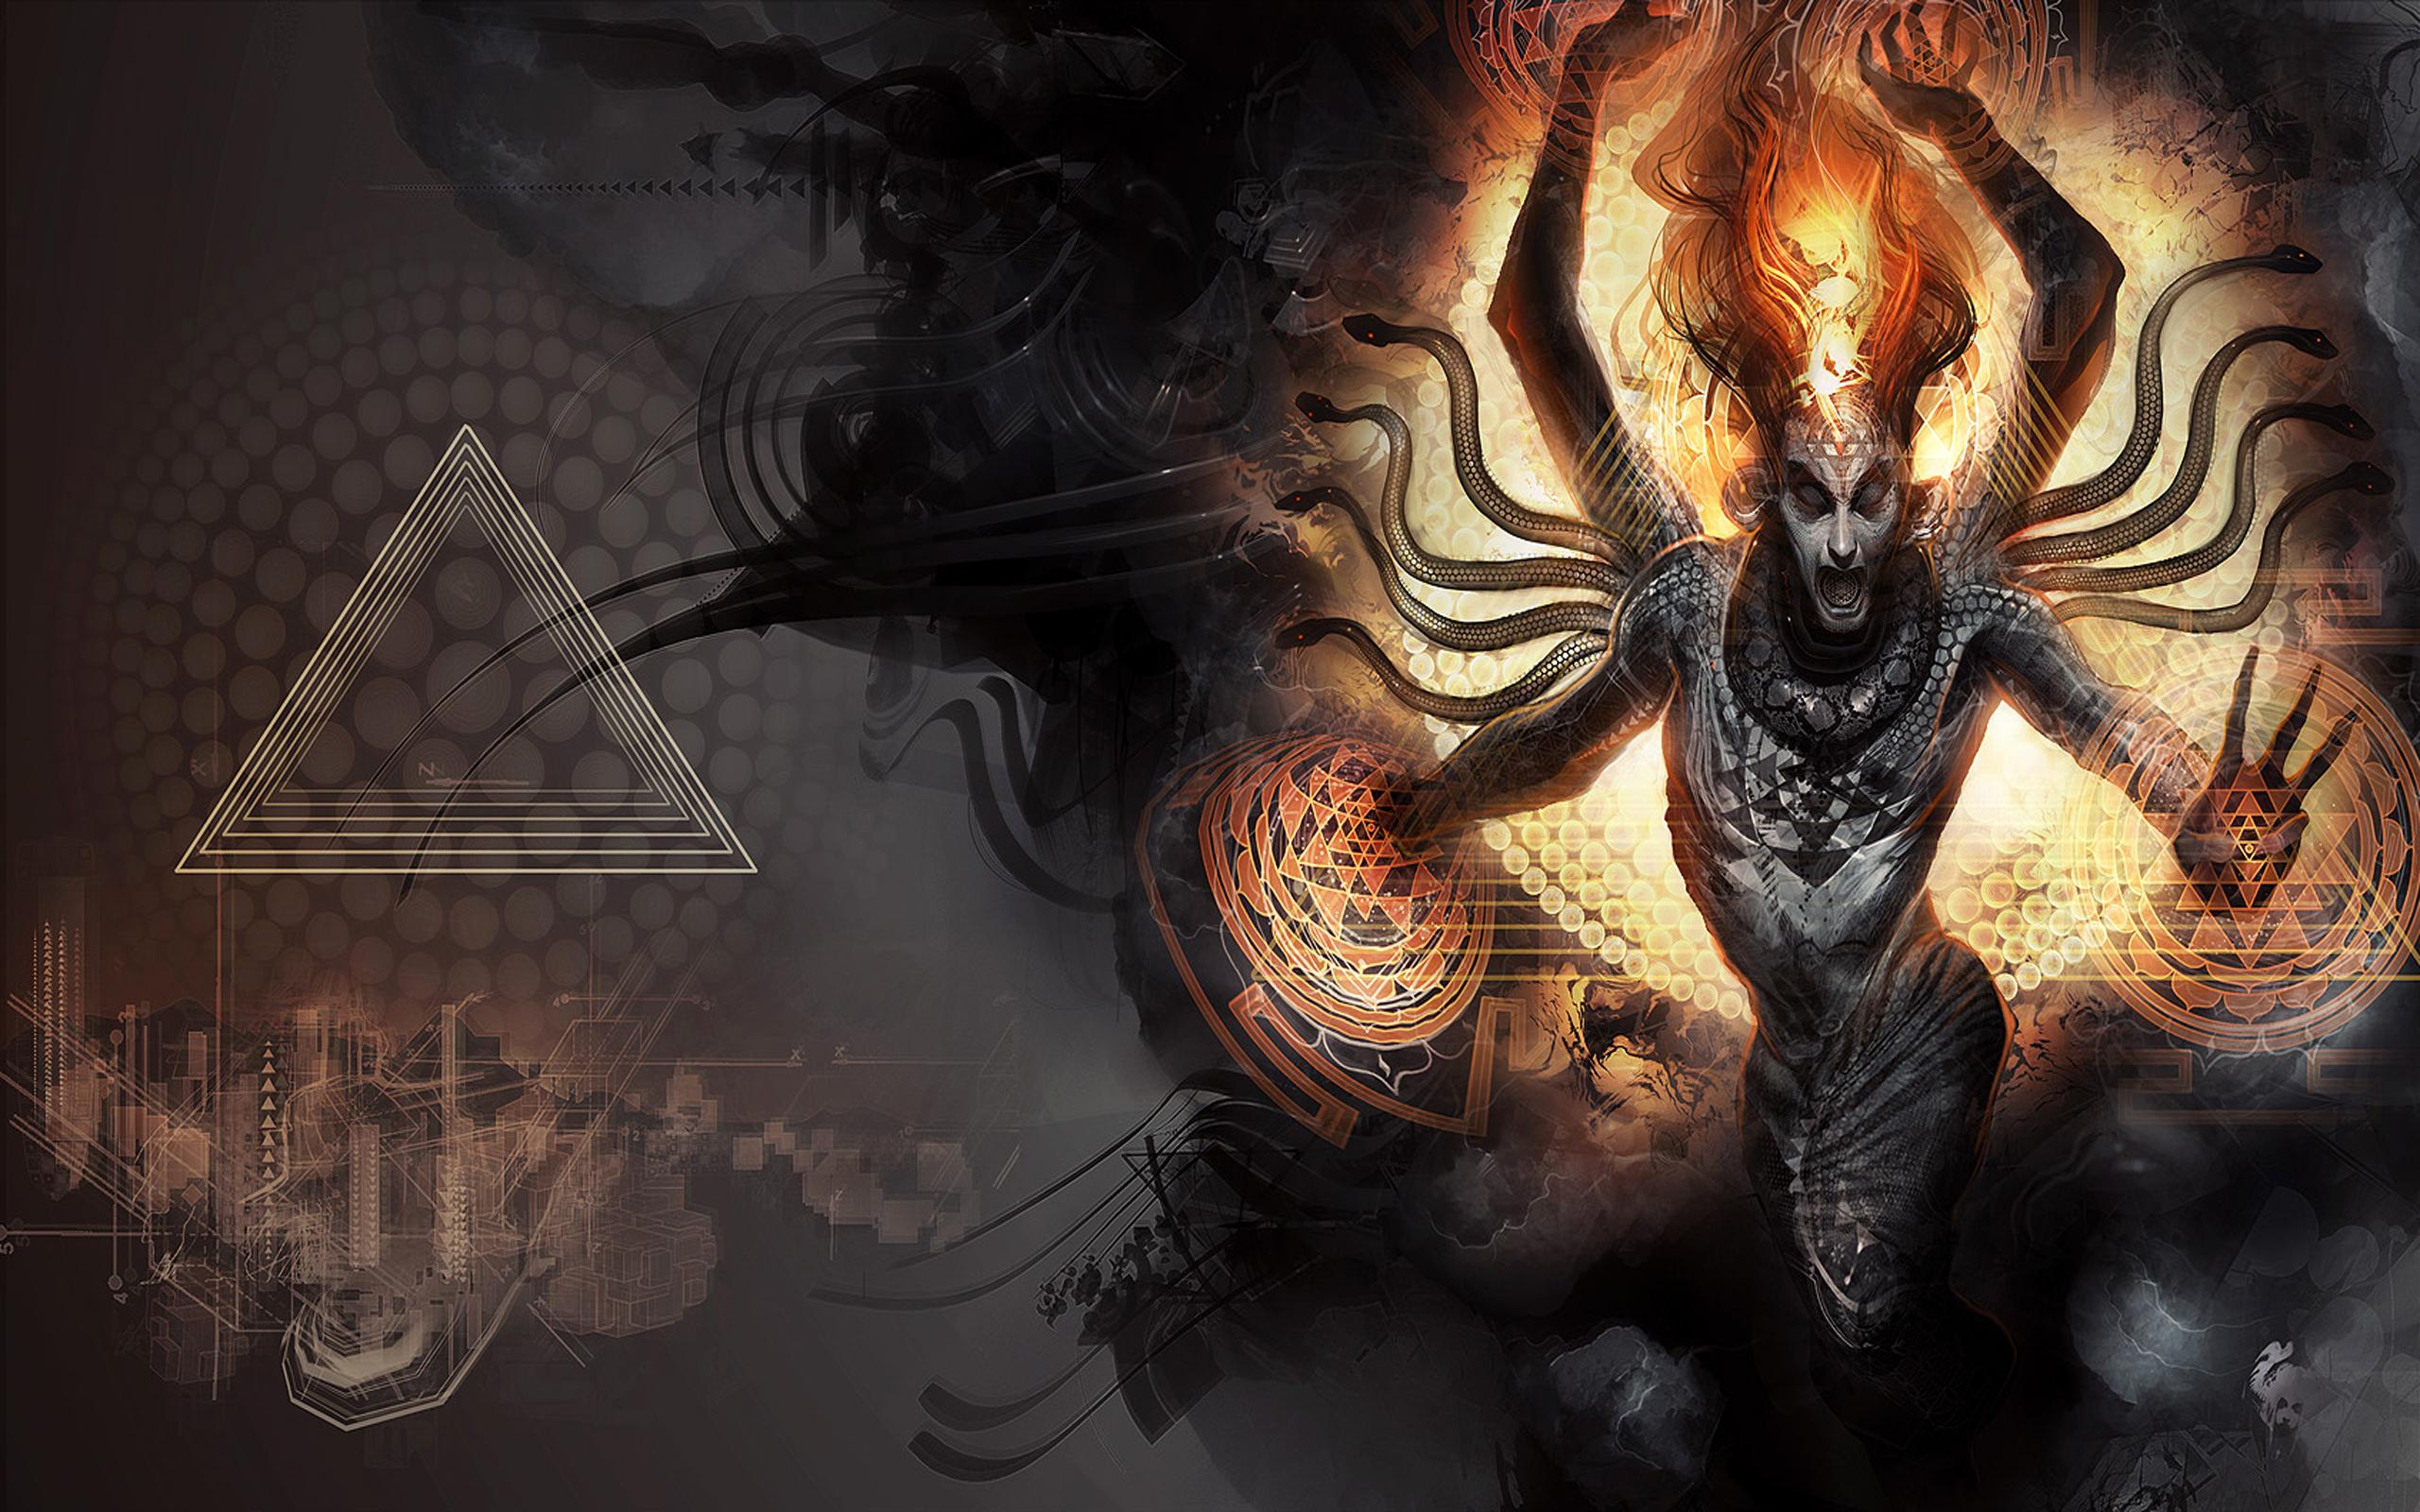 CGI - Sci-fi  Mörk Gothic Bakgrund